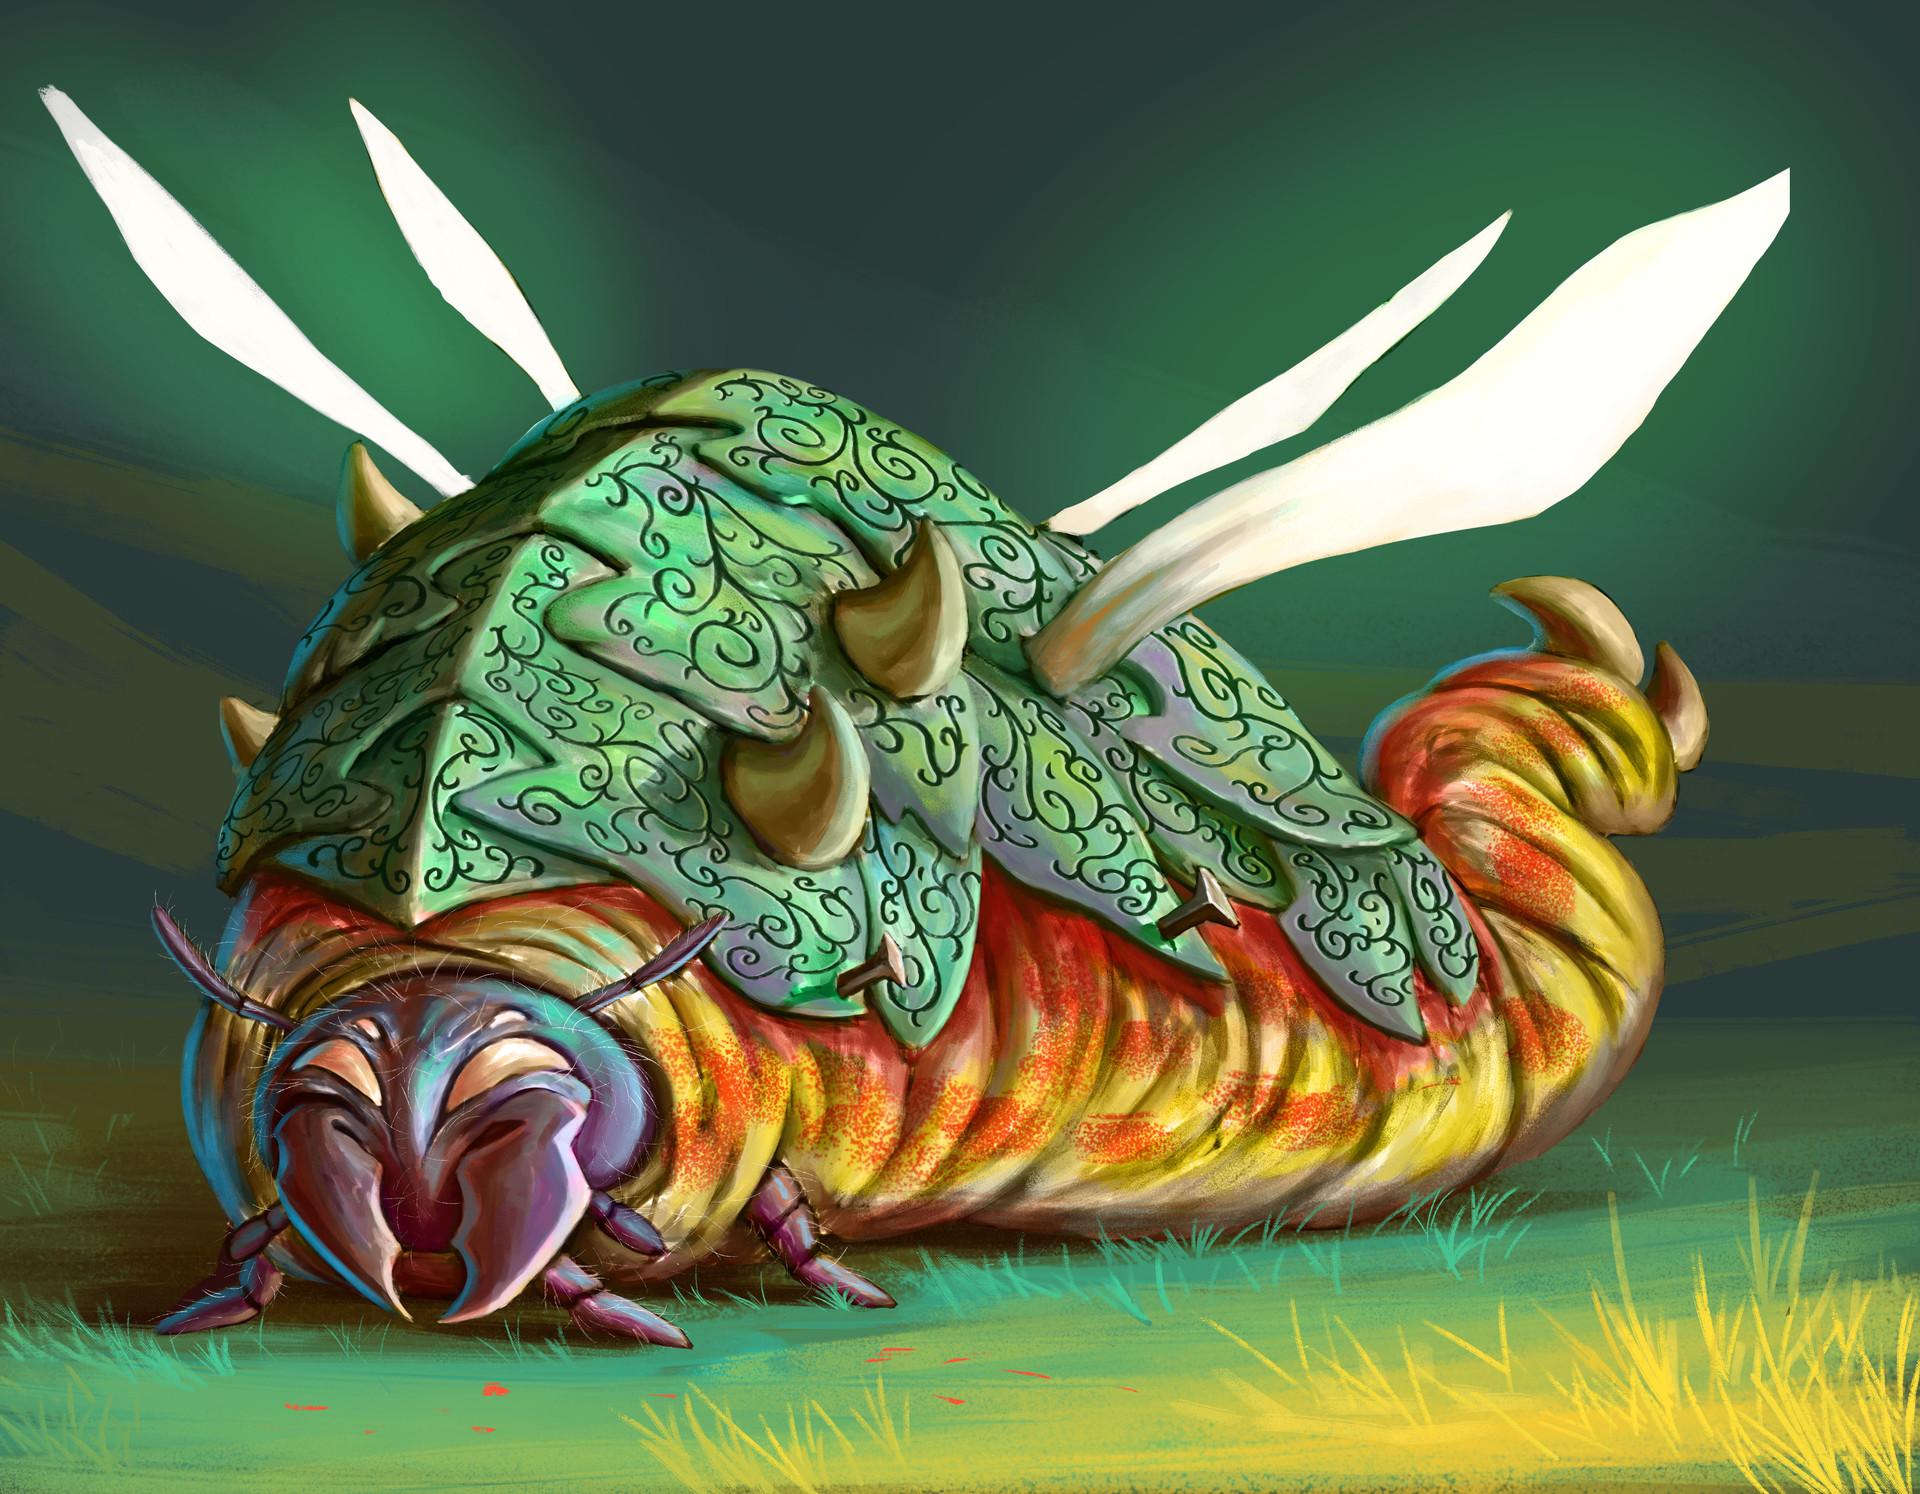 Juanda rico insect warrior